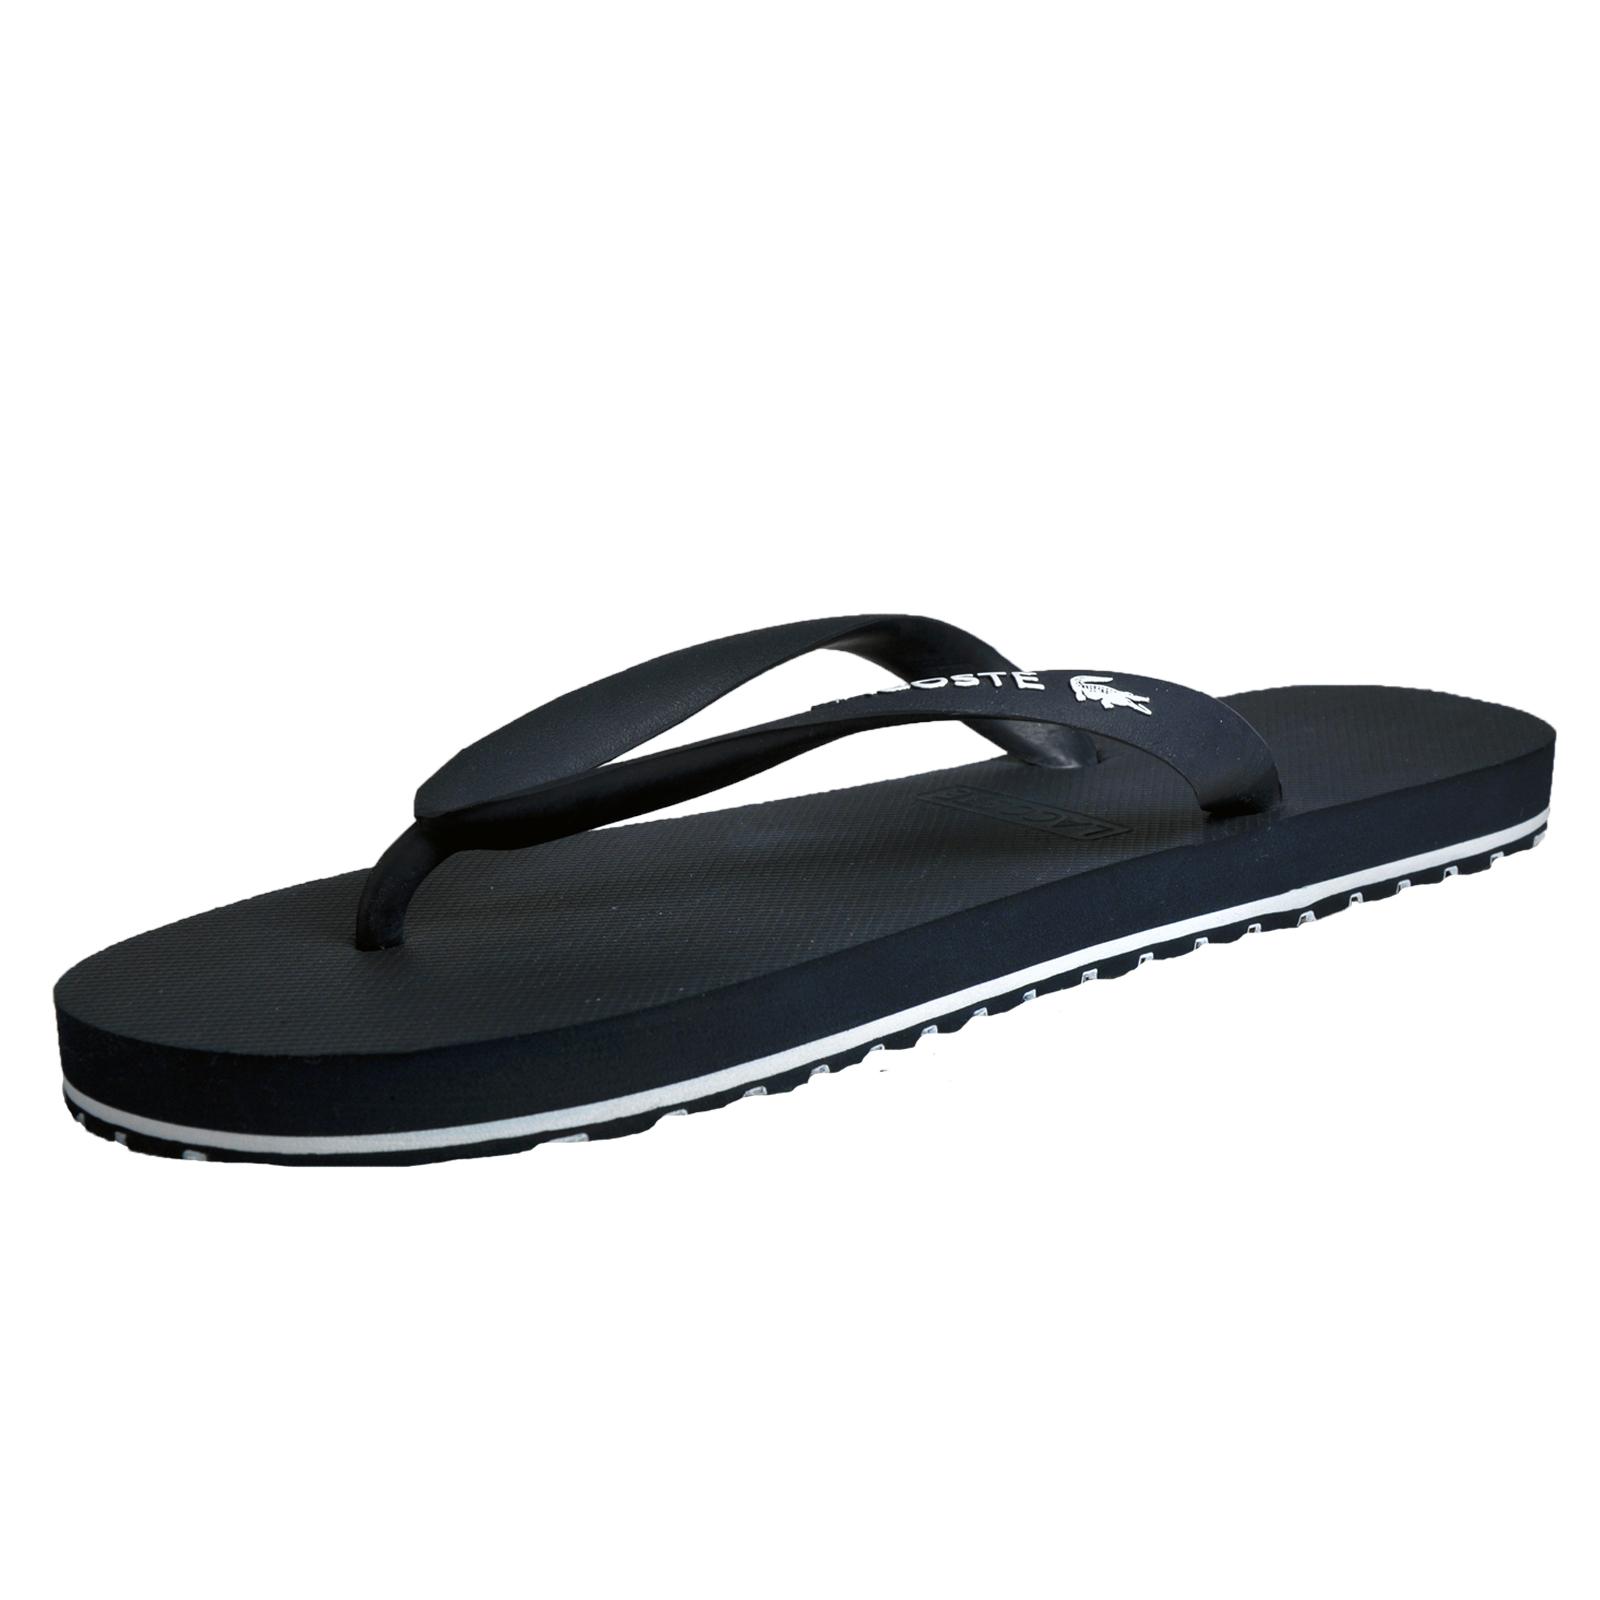 9fa645a5e49108 Details about Lacoste Nosara Mens Premium Designer Flip Flop Holiday Sandals  Navy